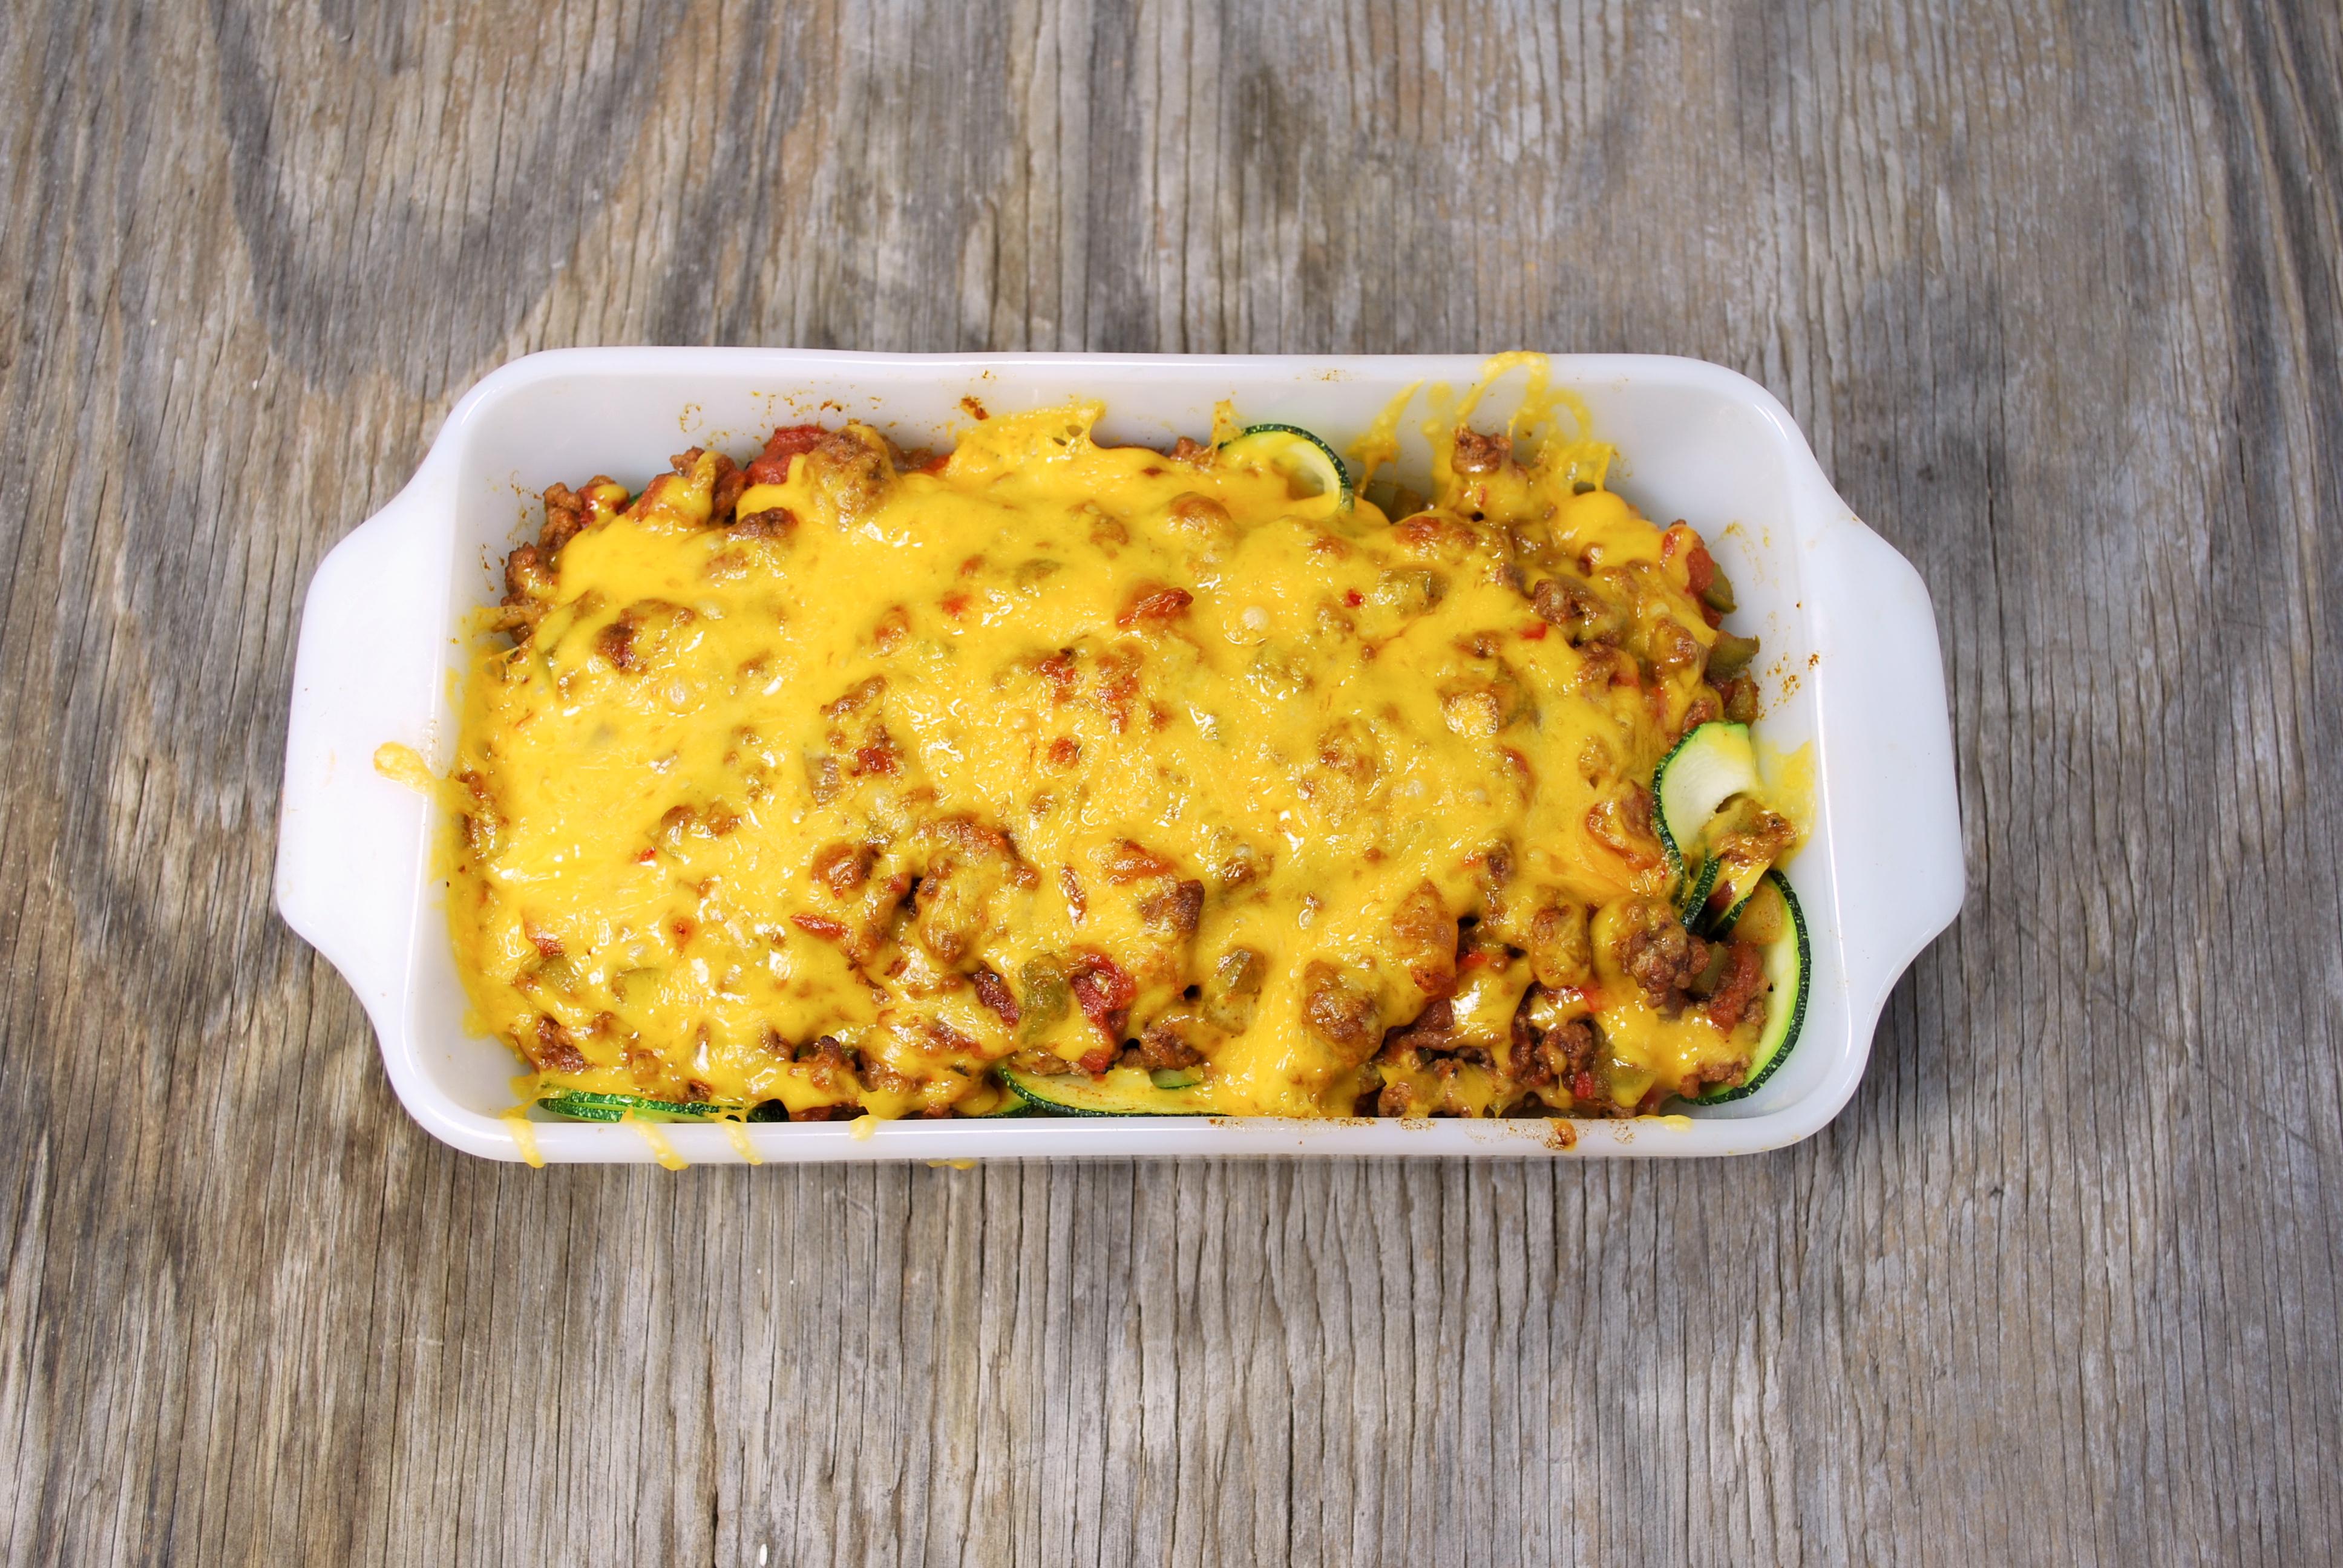 spiralizing recipes - gluten-free main dishes - chili mac